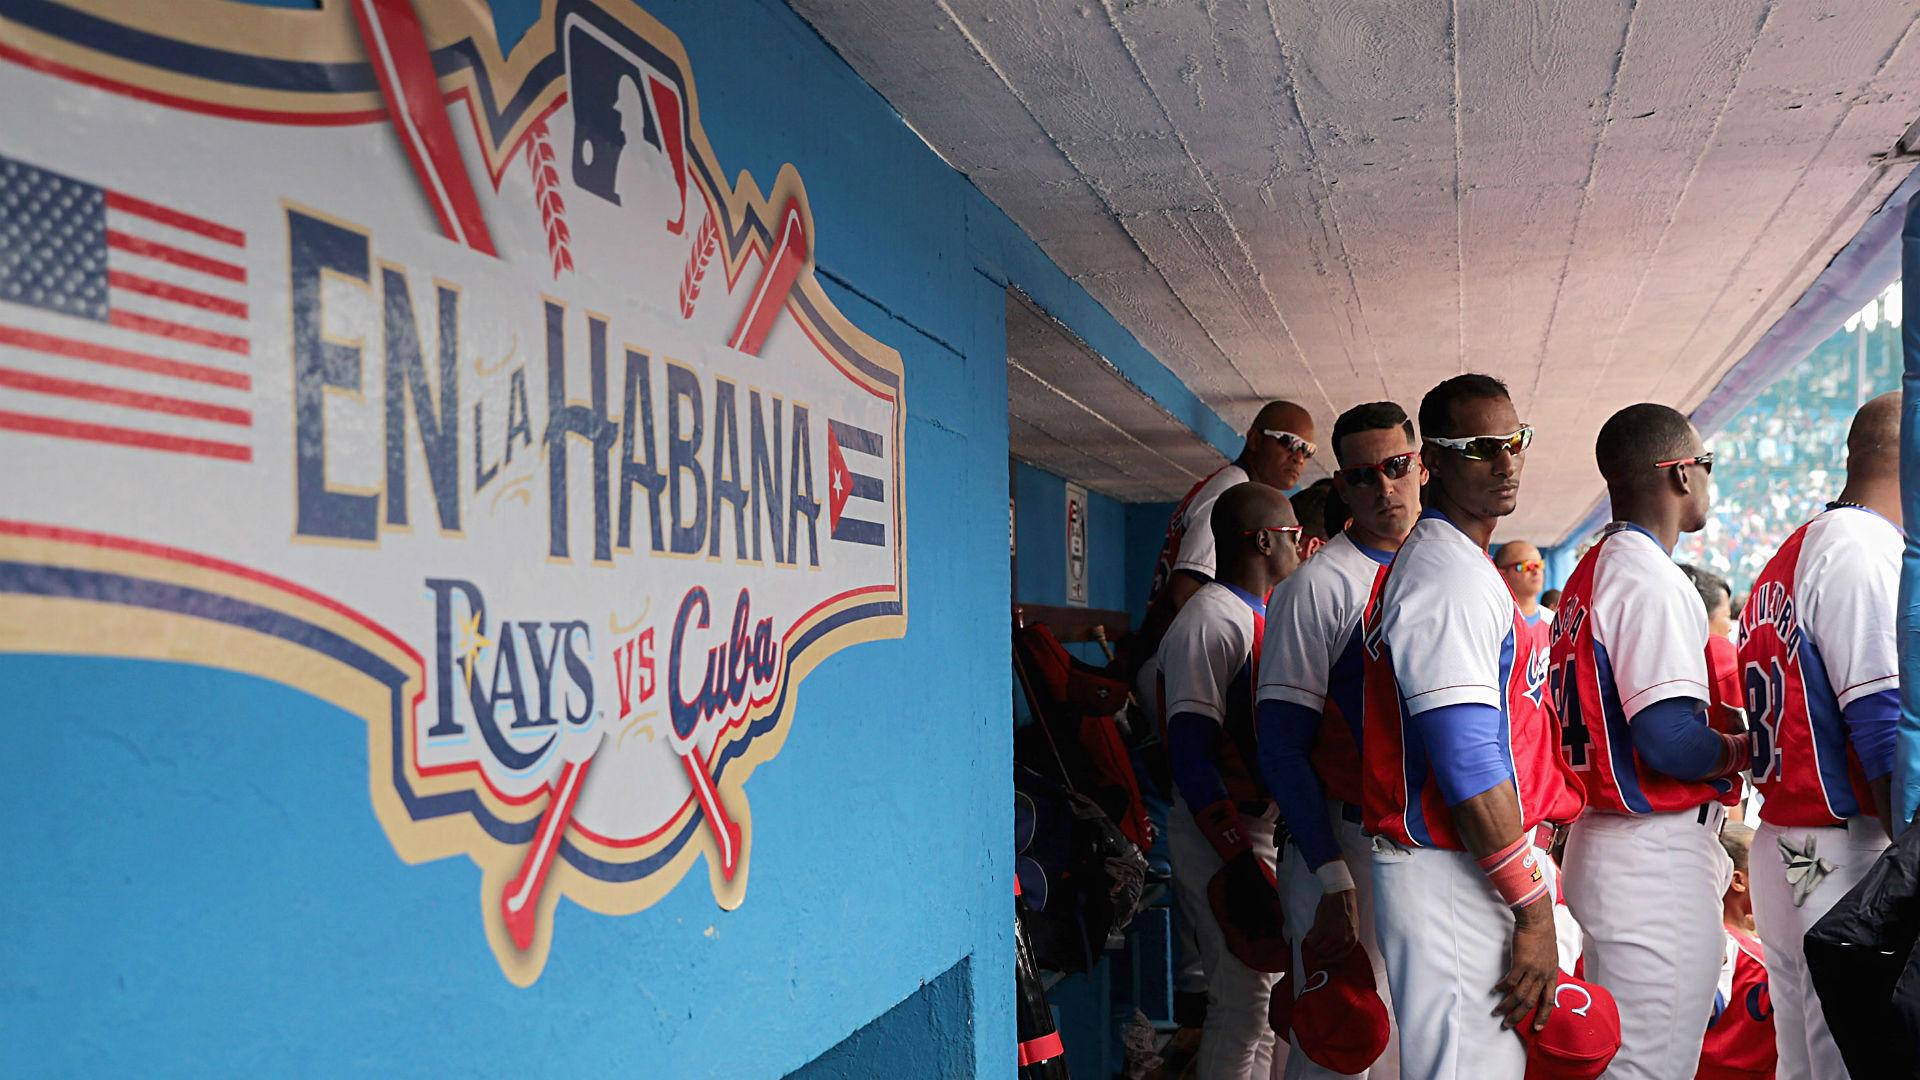 Cuba-baseball-032316-Getty-FTR.jpg